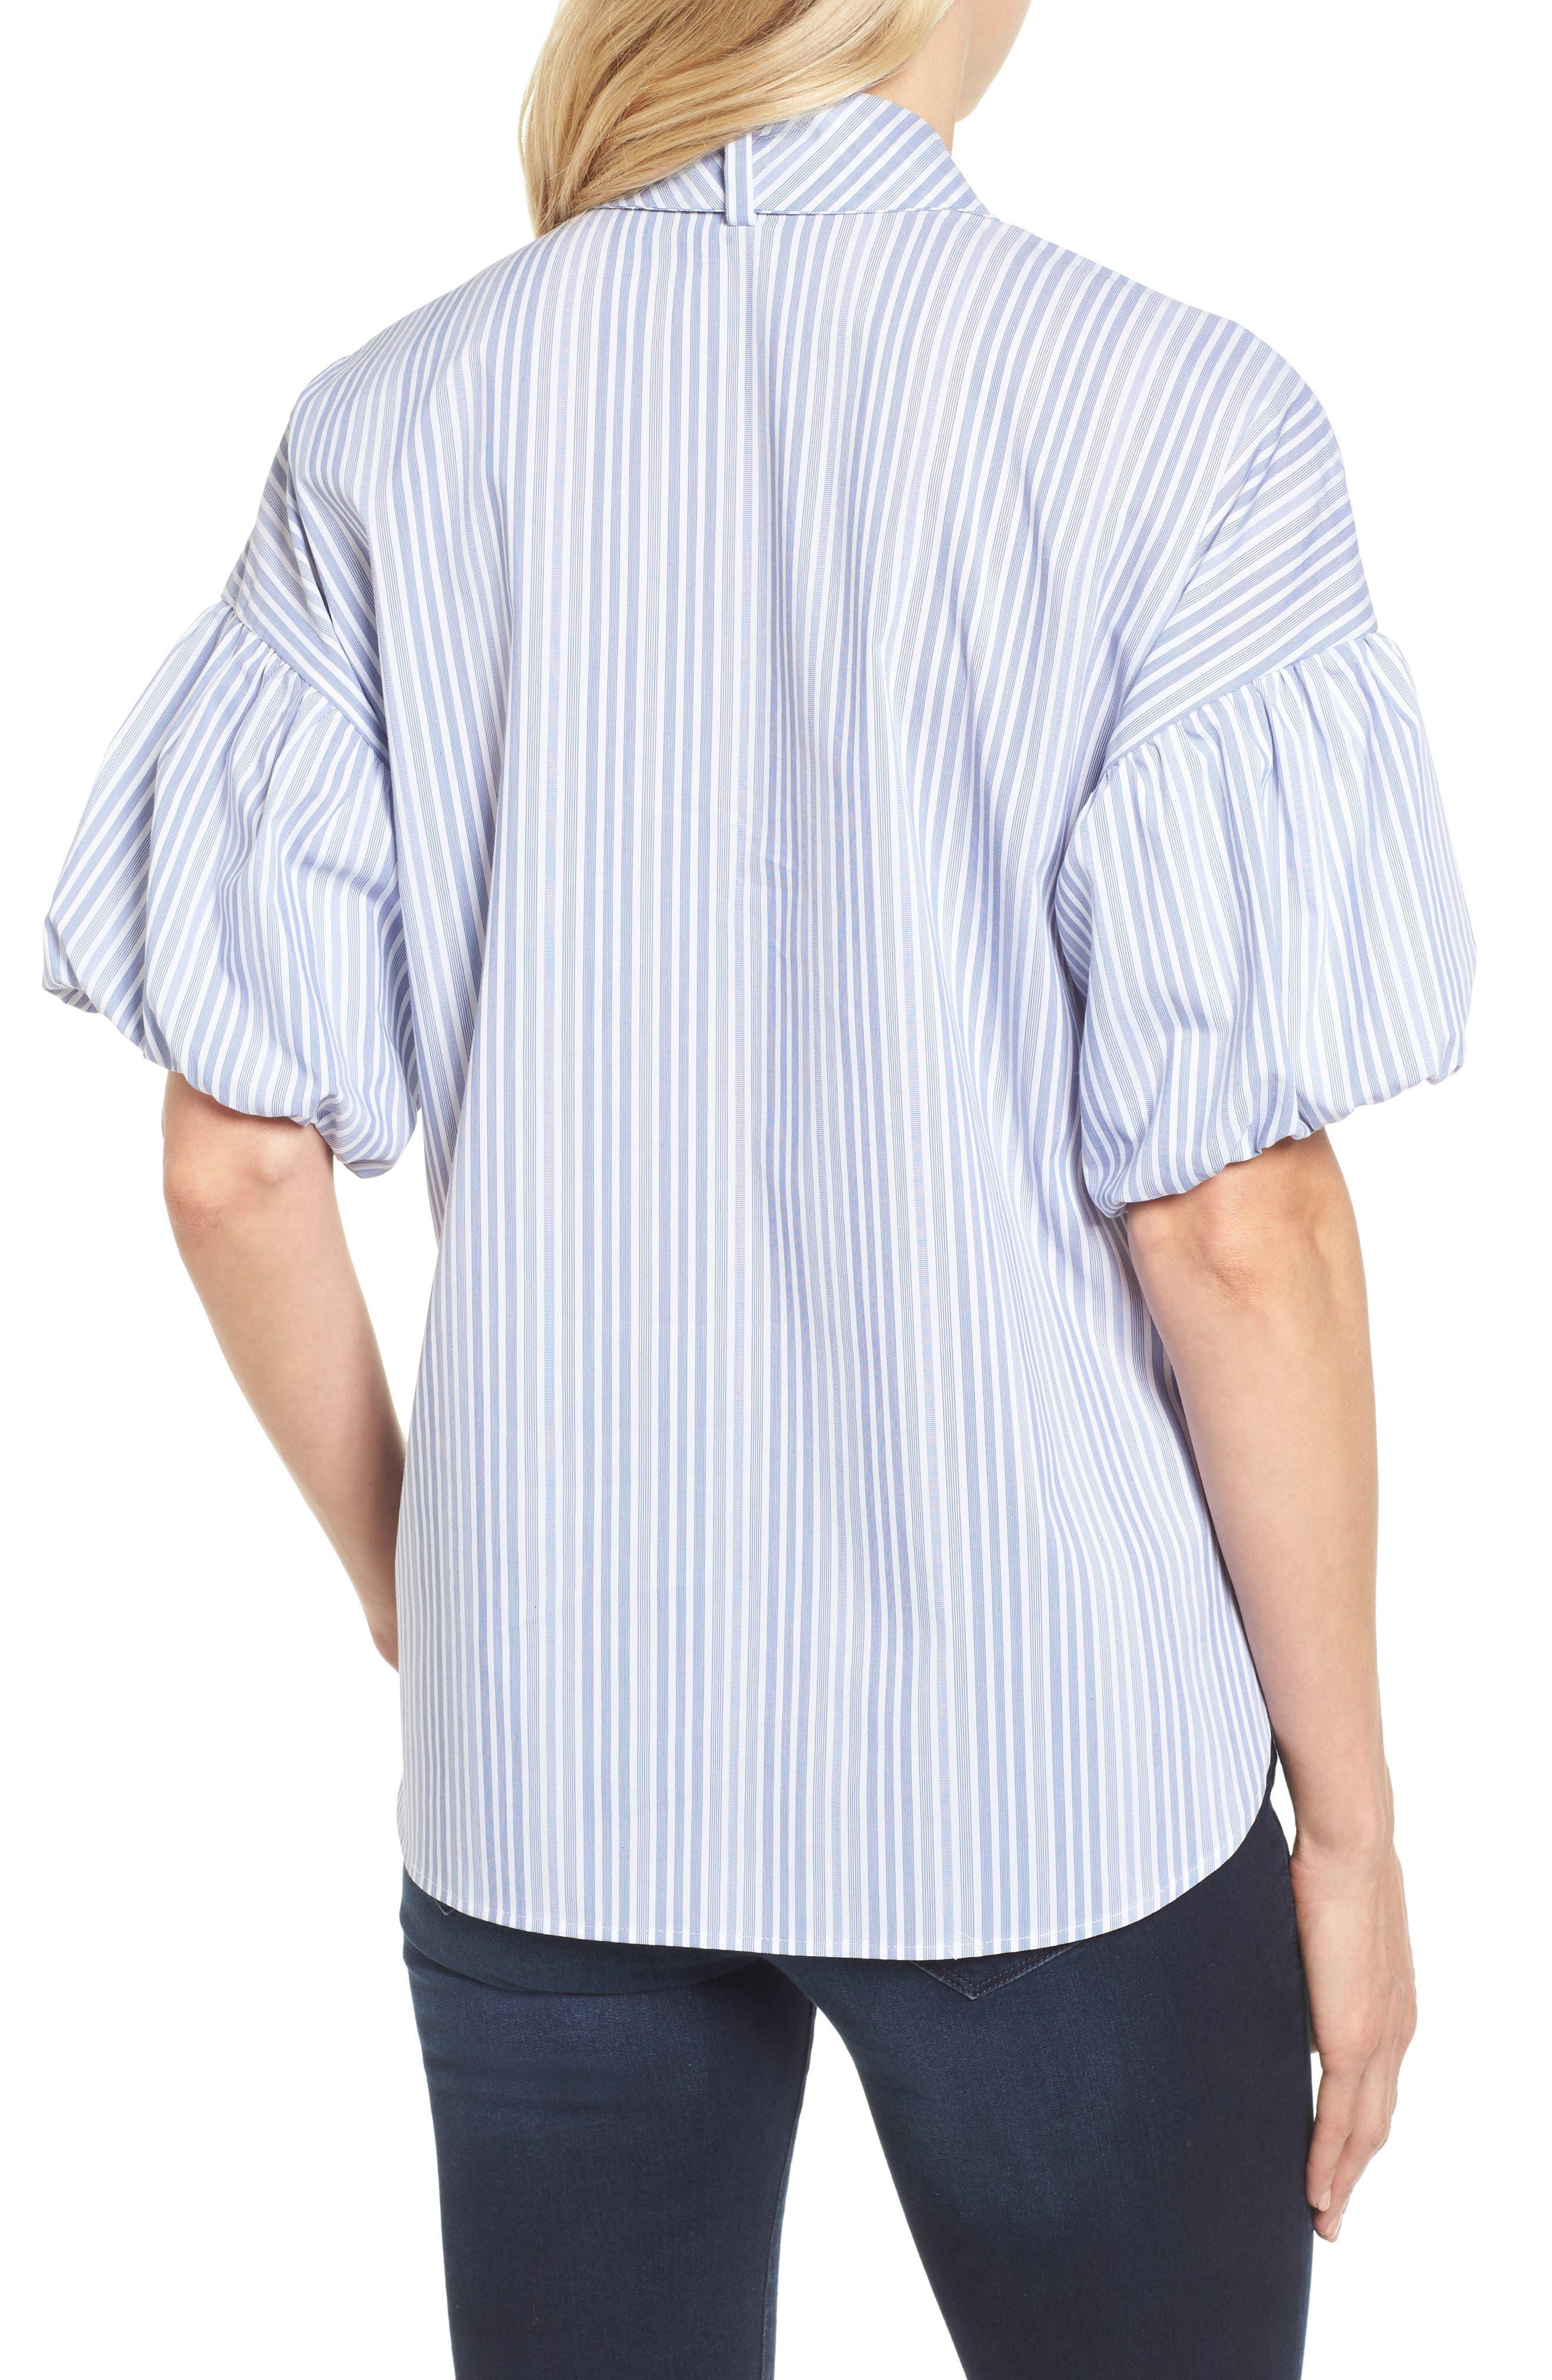 Tie Front Short Sleeve Blouse,                             Alternate thumbnail 3, color,                             Blue- White Stripe